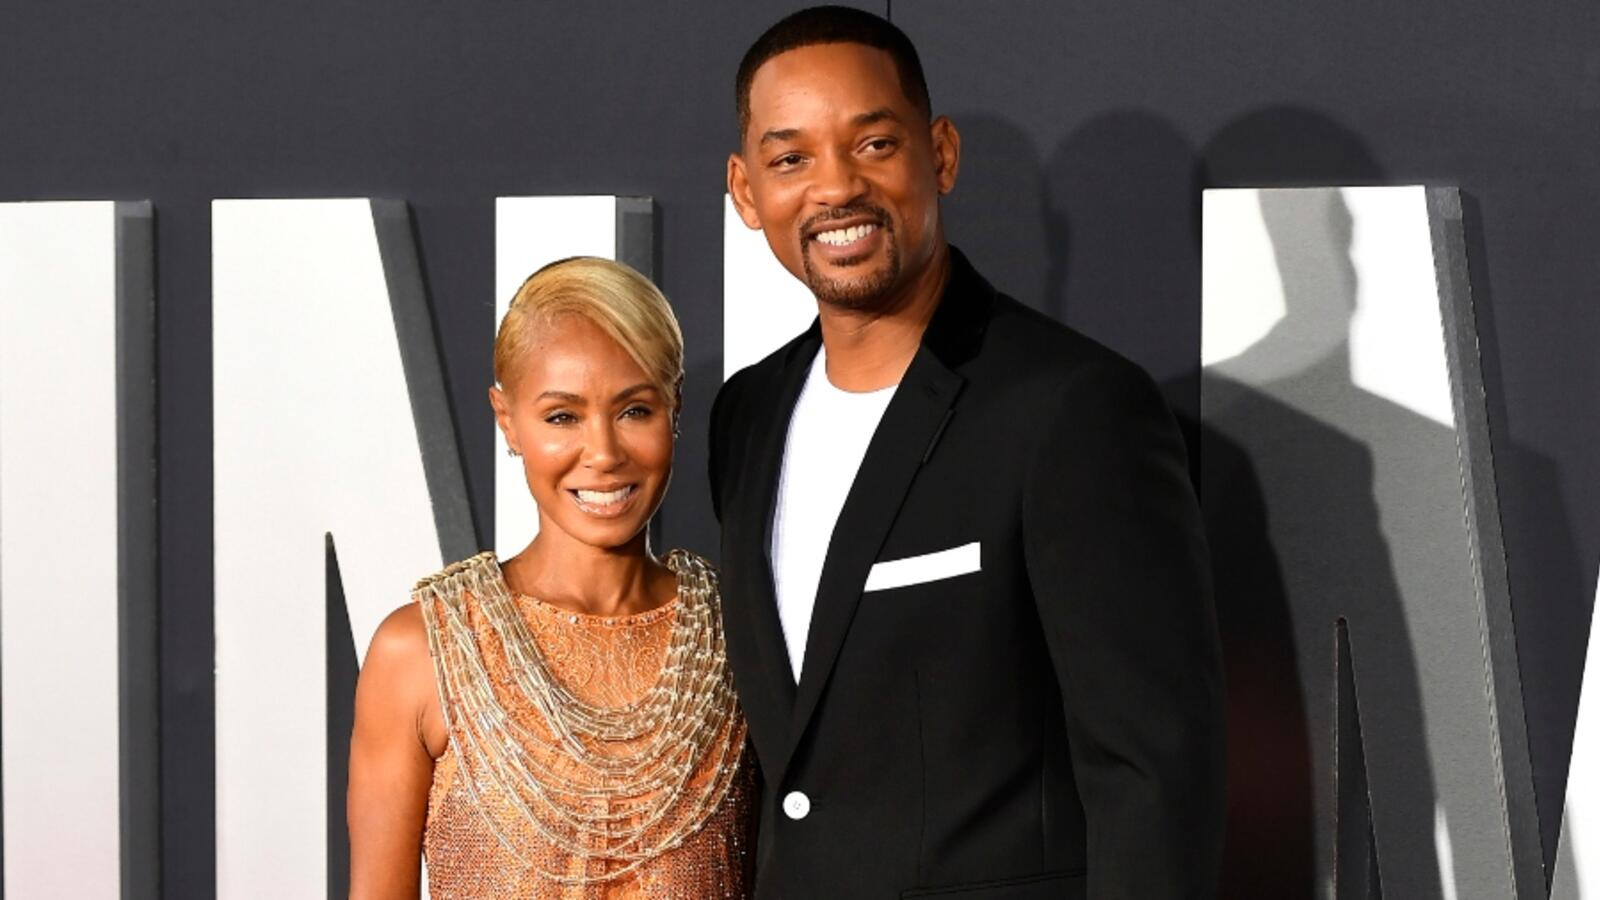 Will Smith Reveals Prior 'Non-Monogamous' Deal With Jada Pinkett-Smith